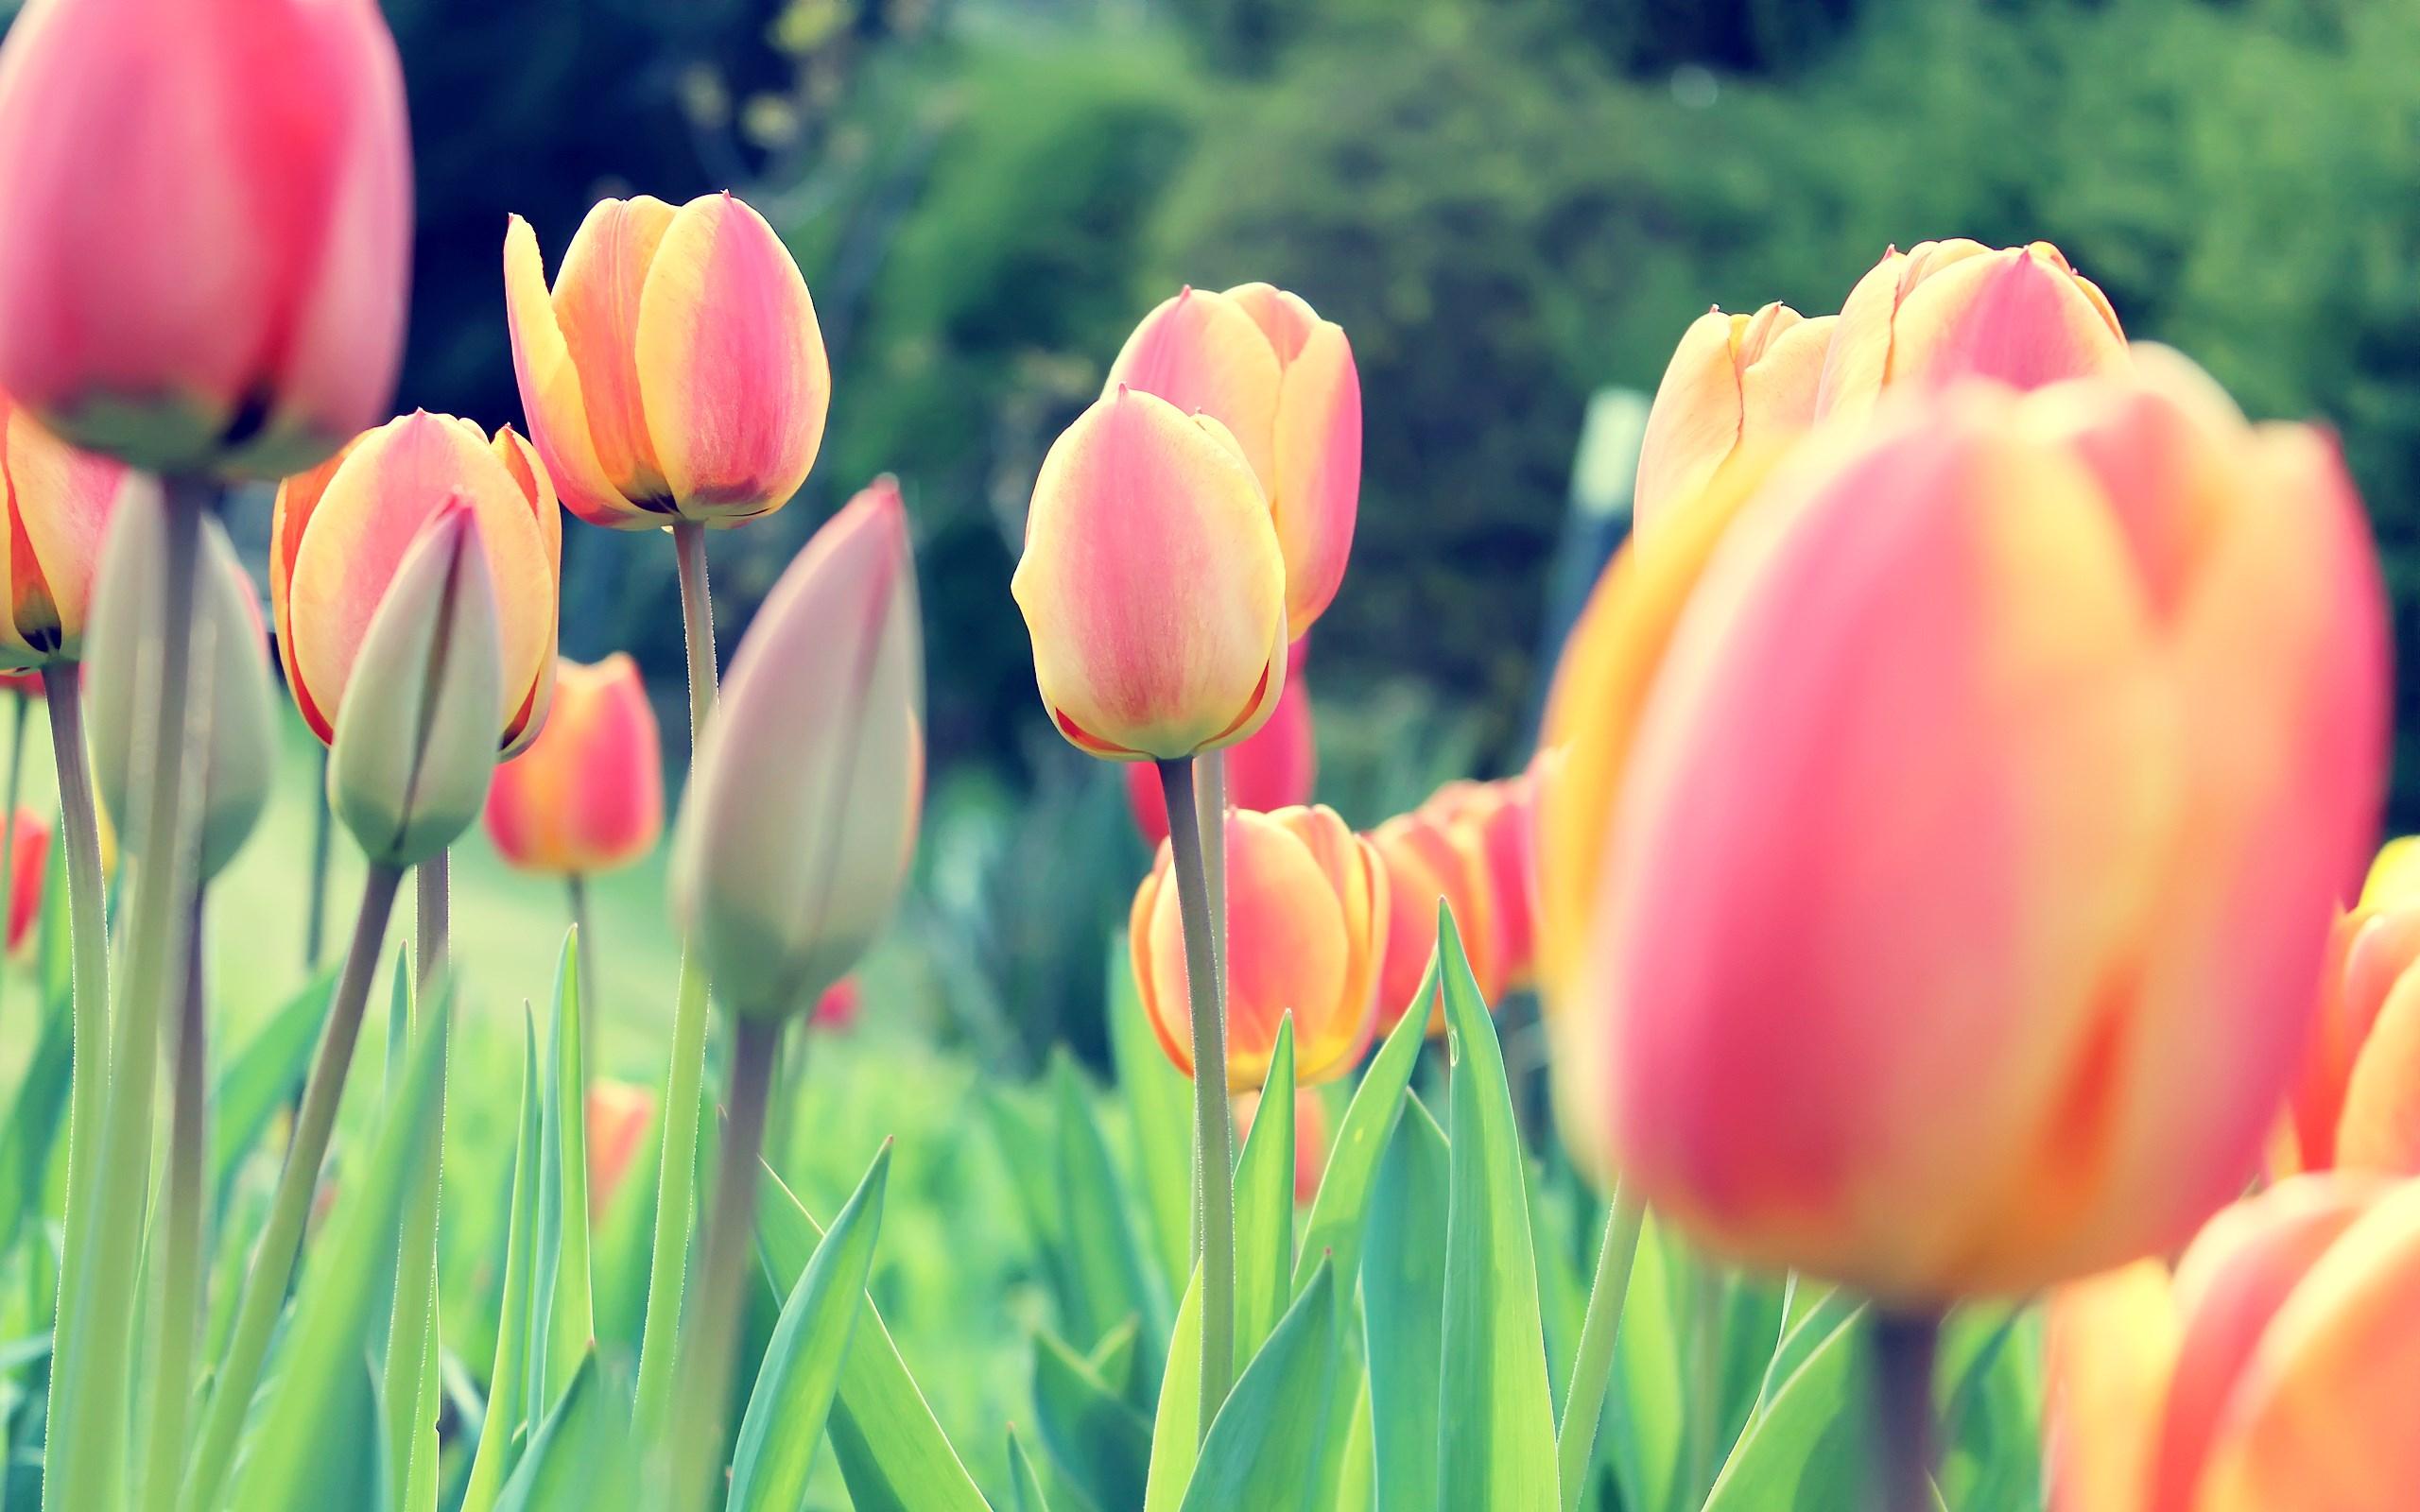 Easter Tulips Wallpaper 2560x1600